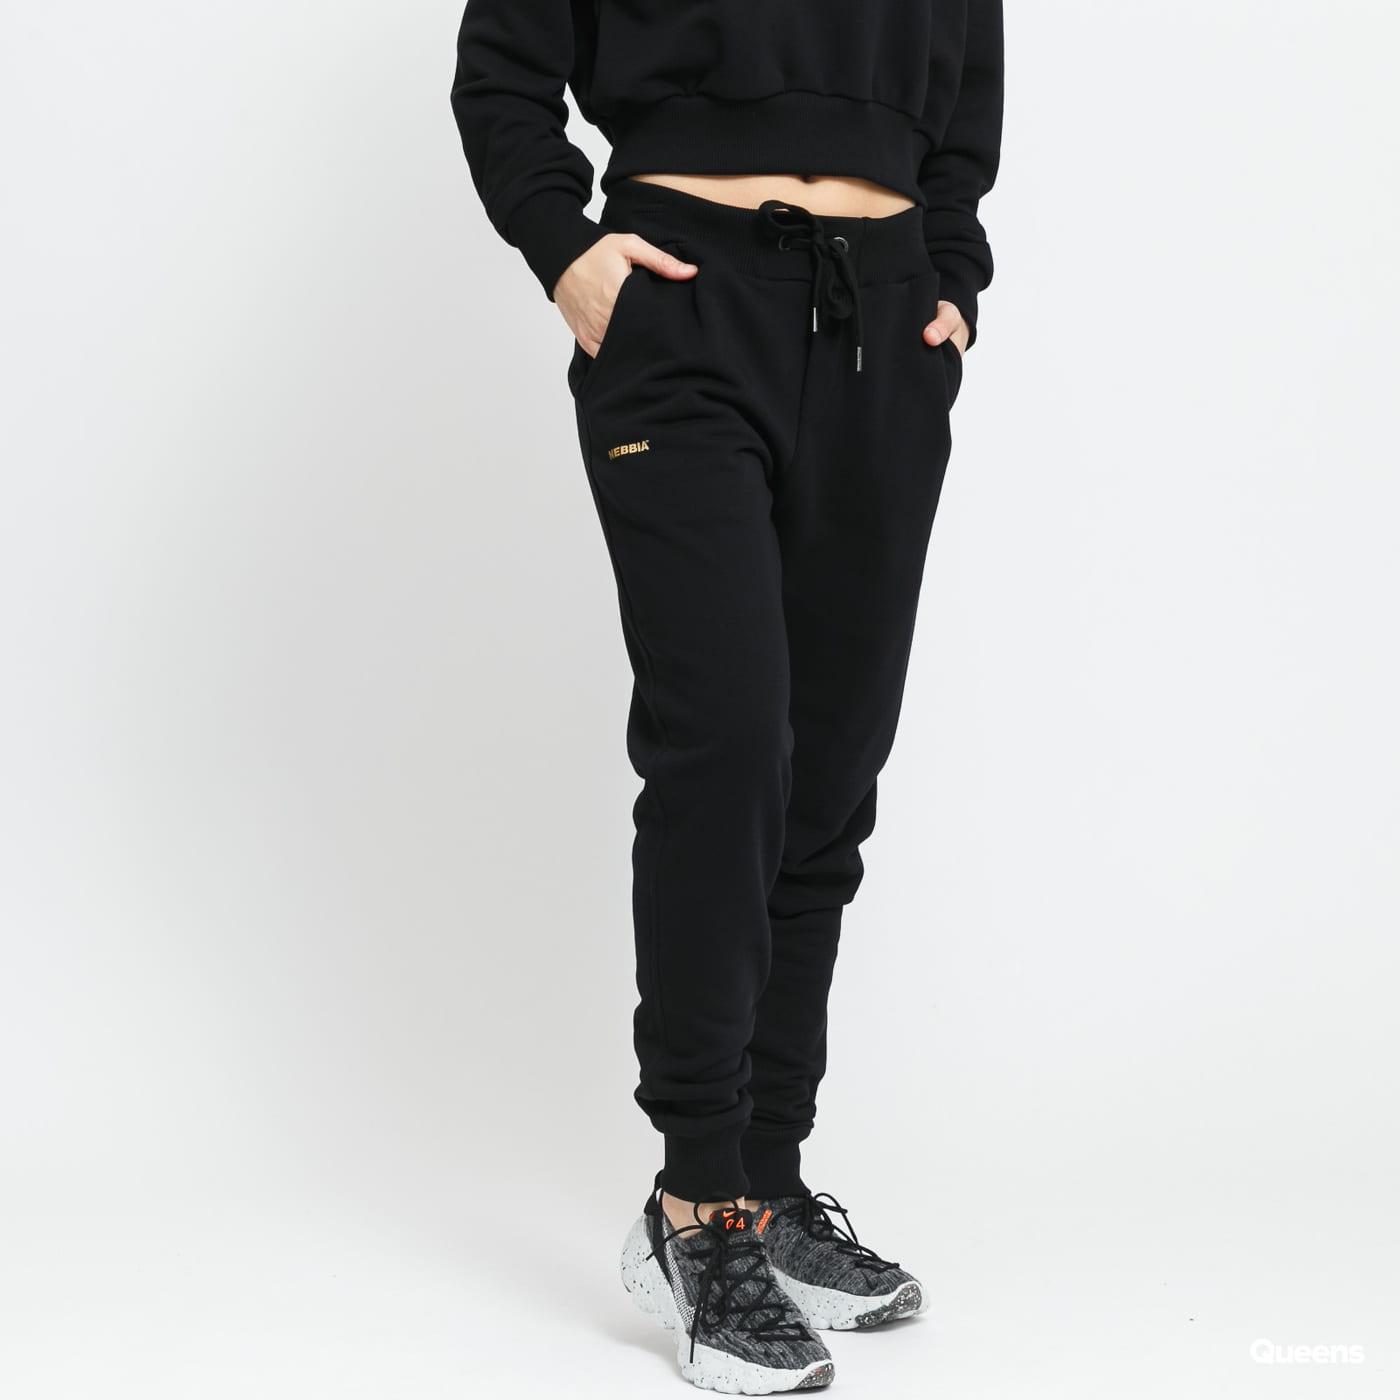 Nebbia Gold Clssic Sweatpants black / golden